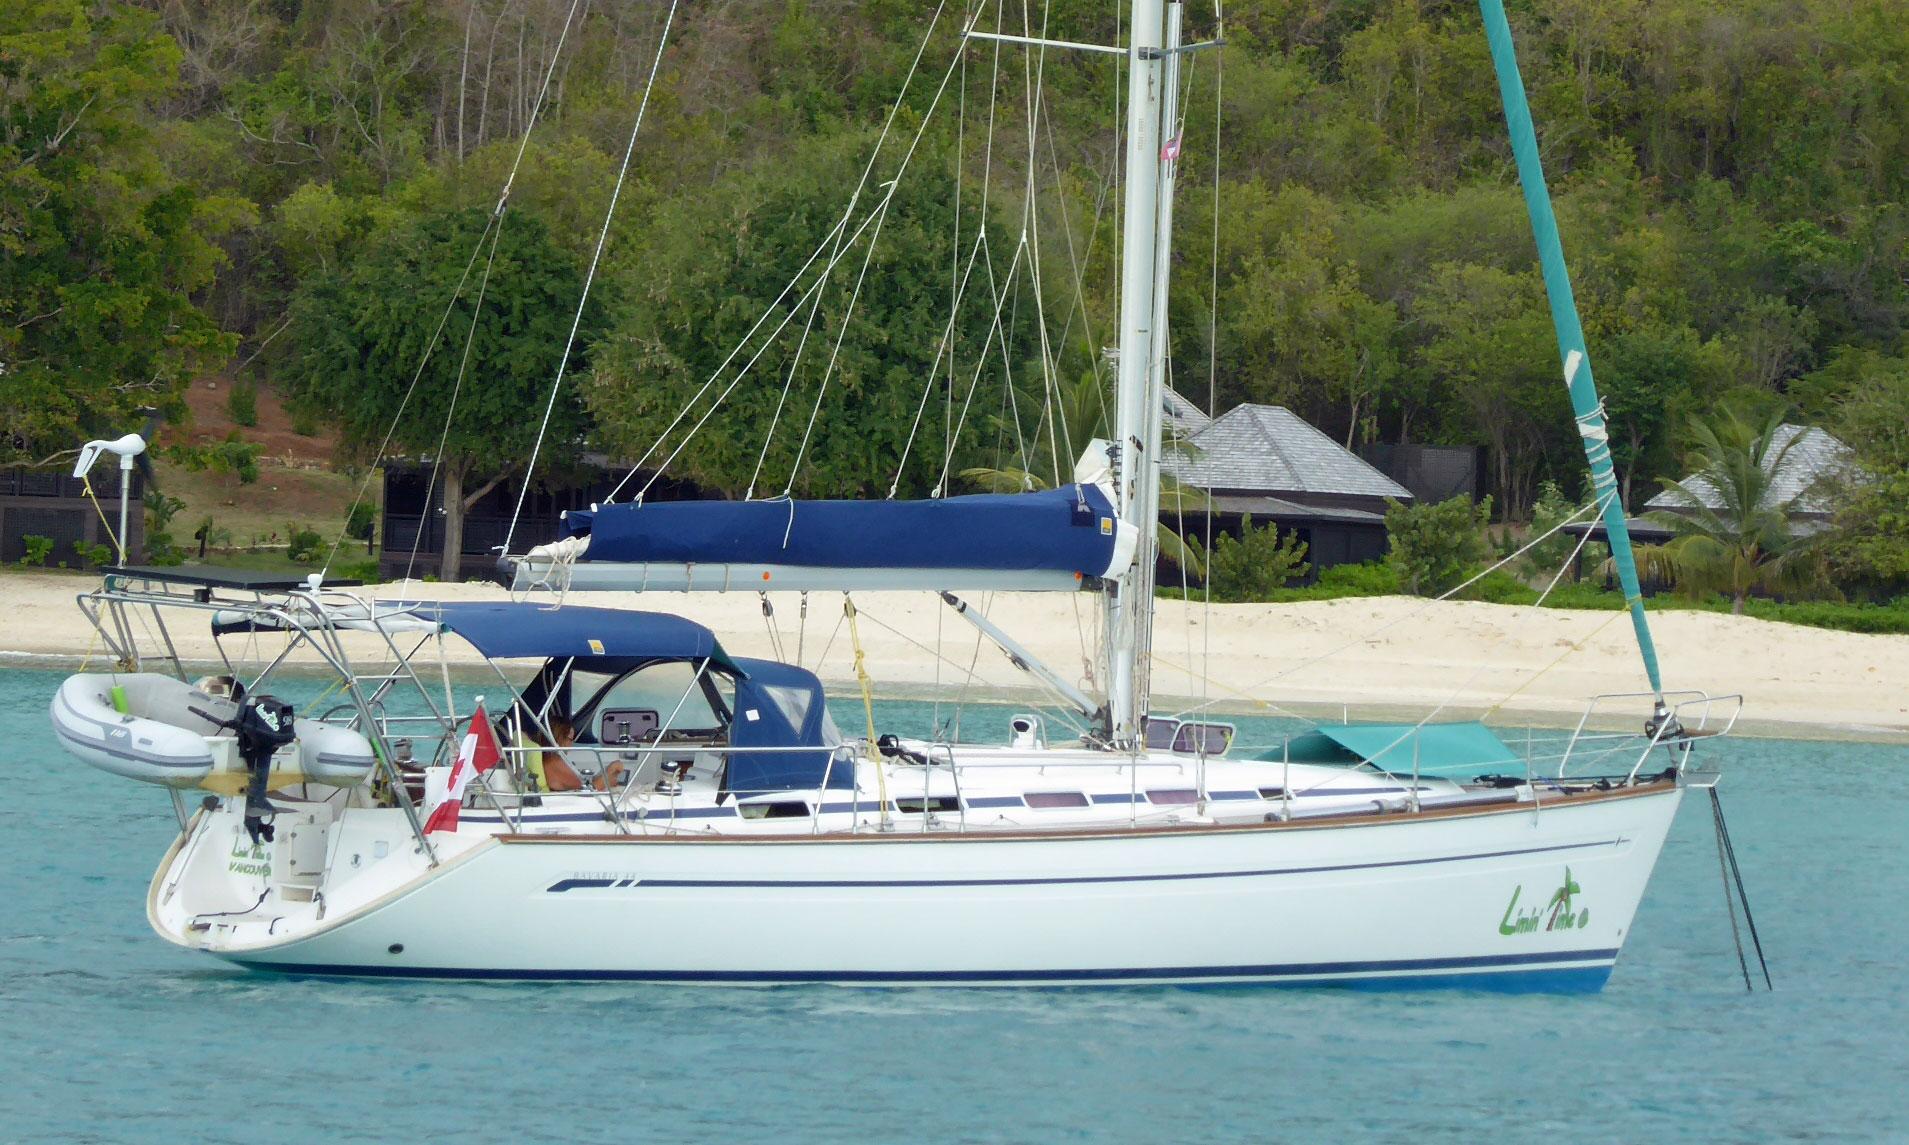 A Bavaria 44 cruising yacht